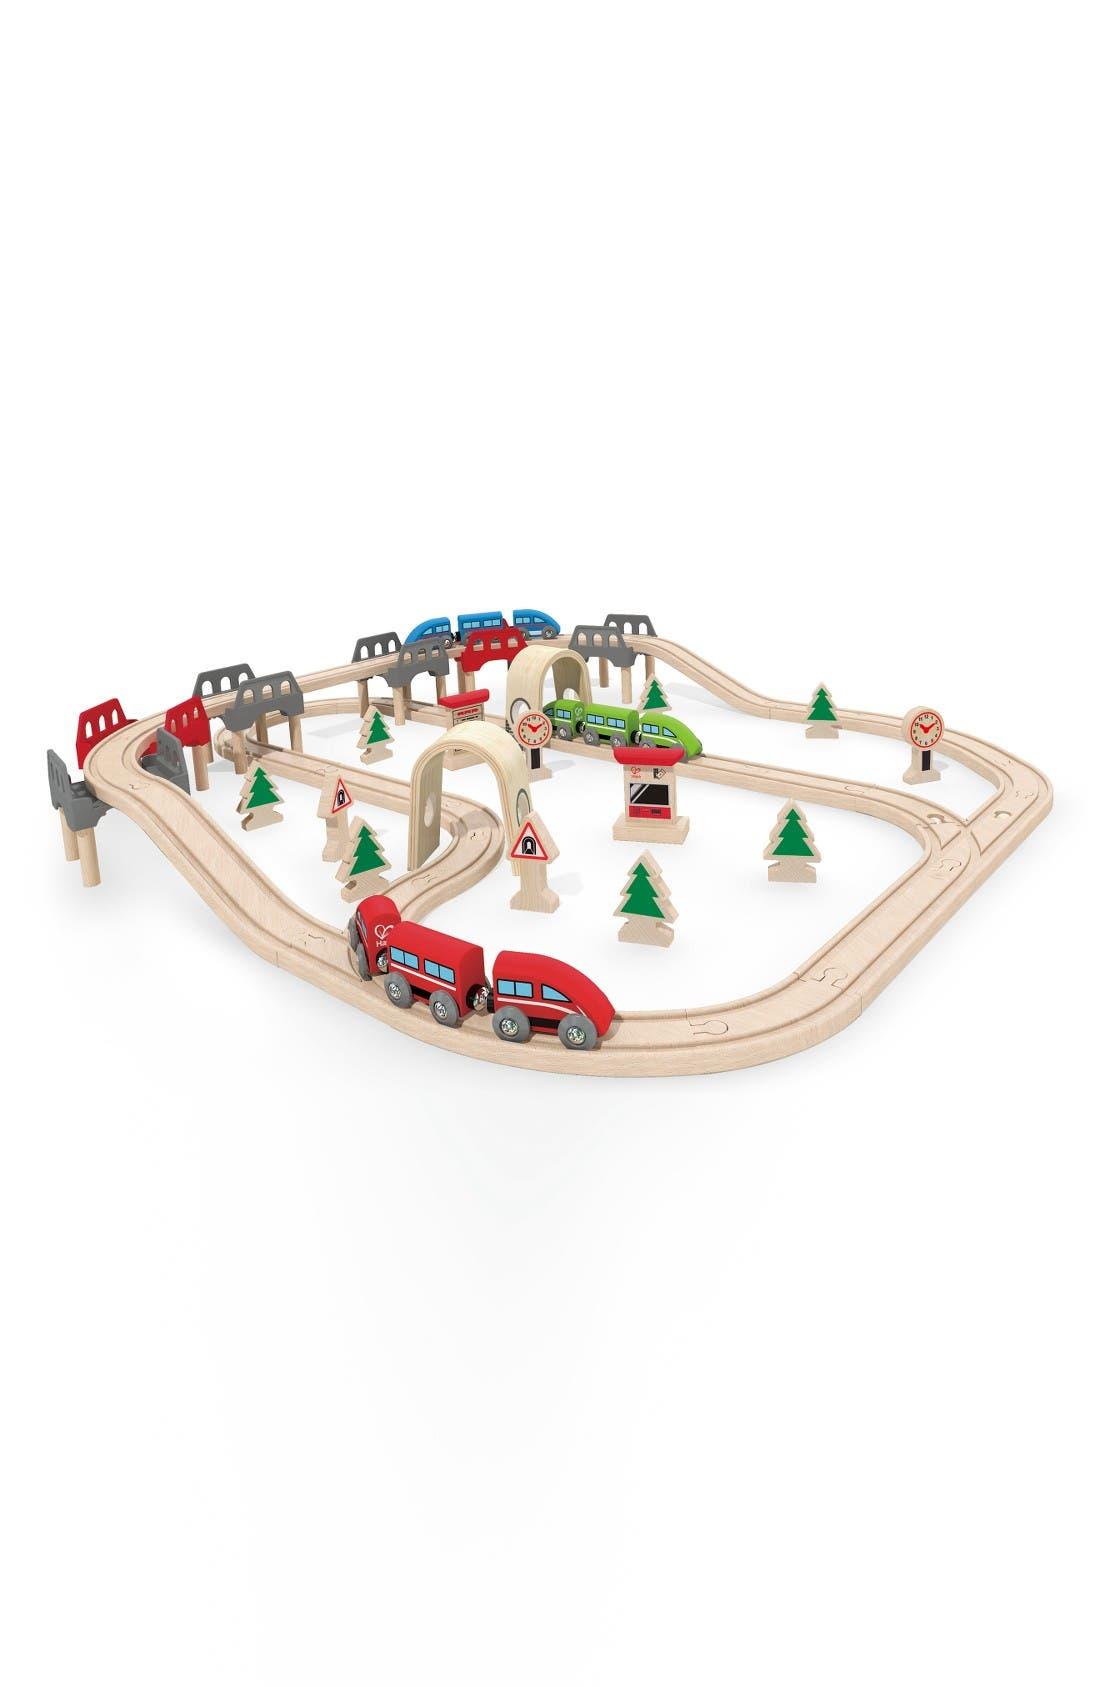 Main Image - Hape High & Low Railway Set